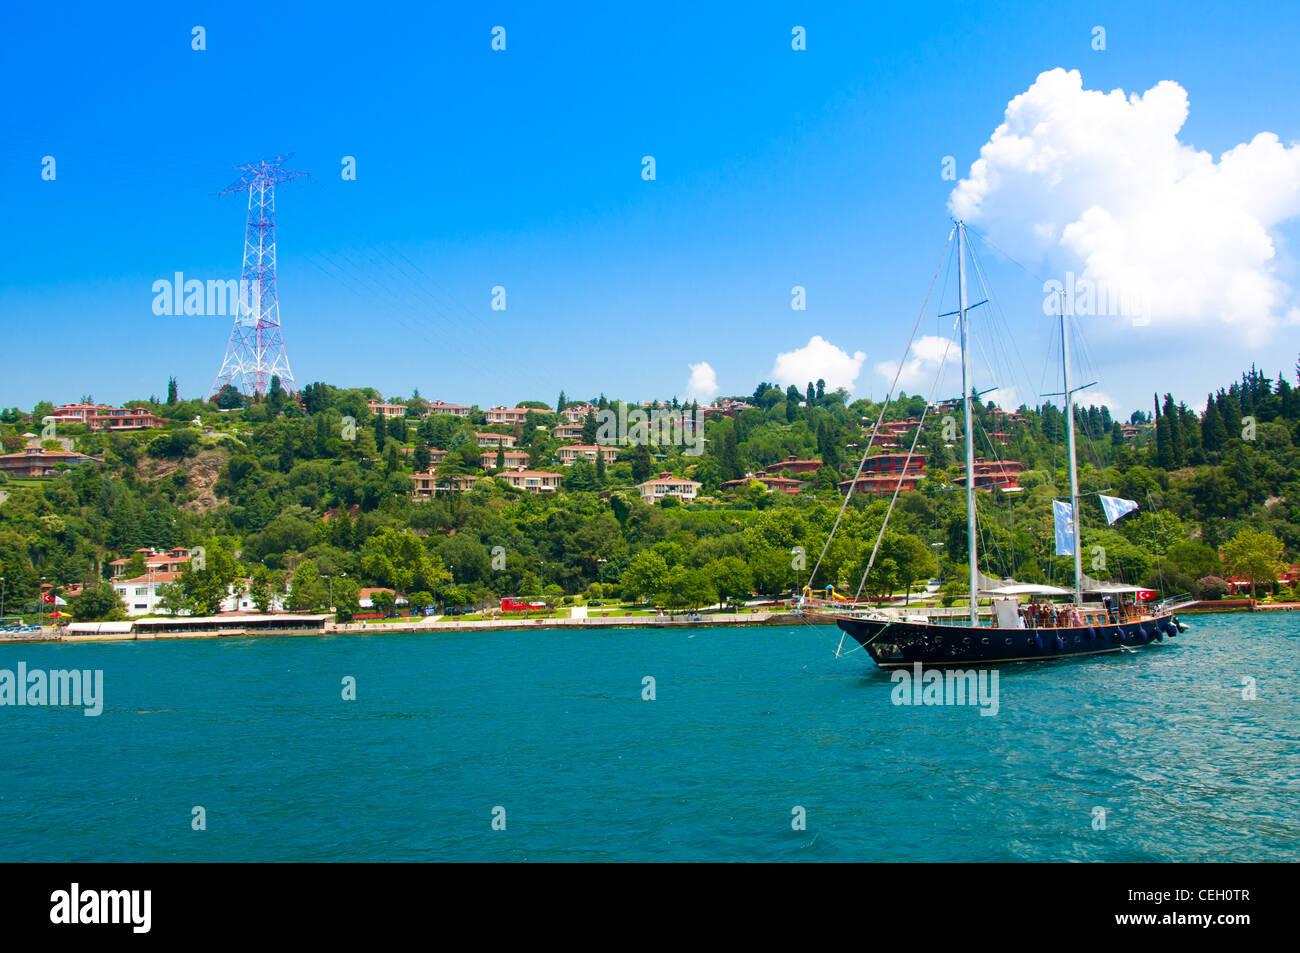 Elite part of Istanbul, Turkey - Stock Image